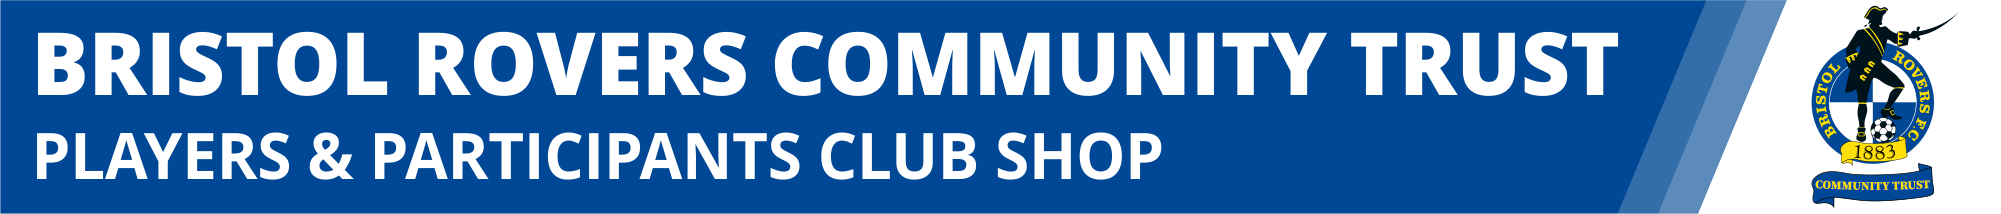 bristol-rovers-fc-community-trust-players-participants-club-shop-banner.png